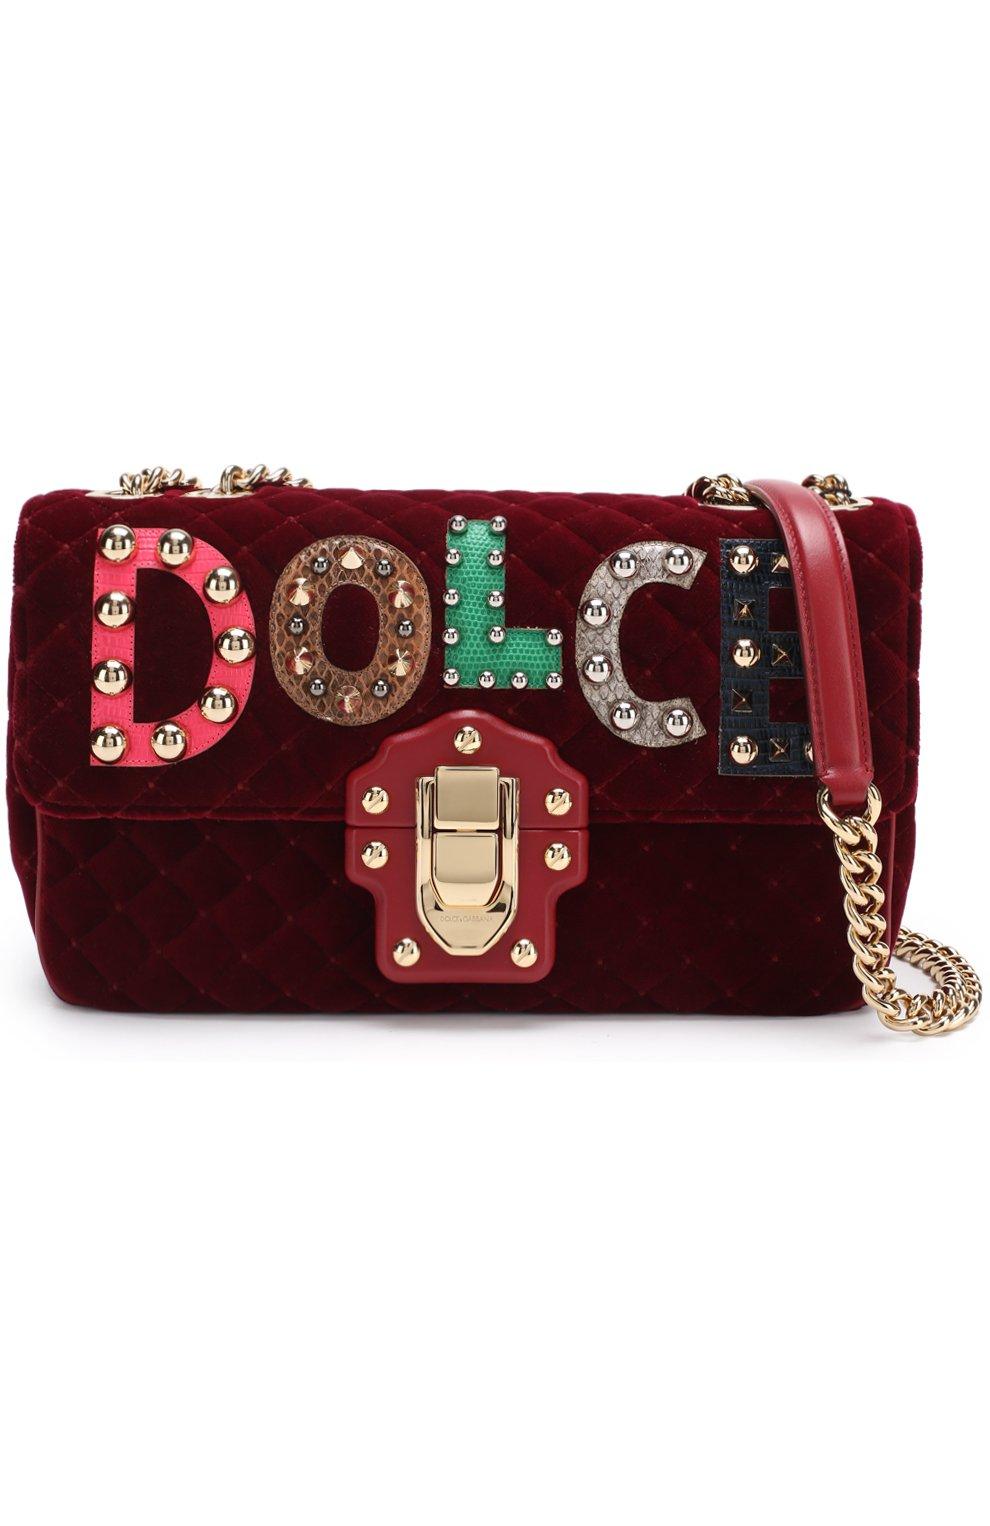 Сумка Lucia с аппликациями Dolce & Gabbana бордовая цвета   Фото №6